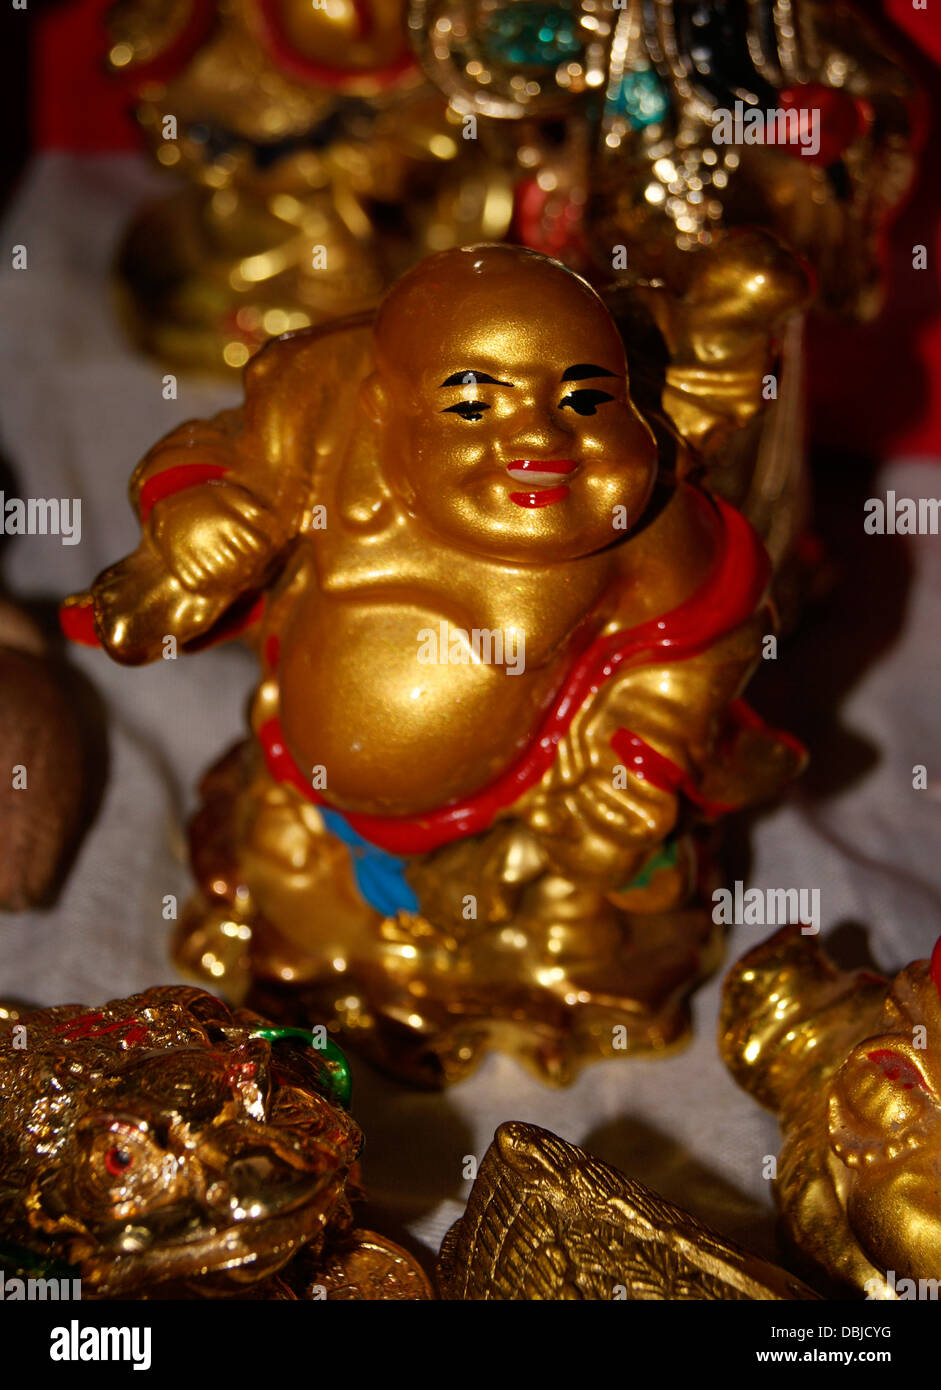 golden laughing buddha feng shui stock photos golden. Black Bedroom Furniture Sets. Home Design Ideas